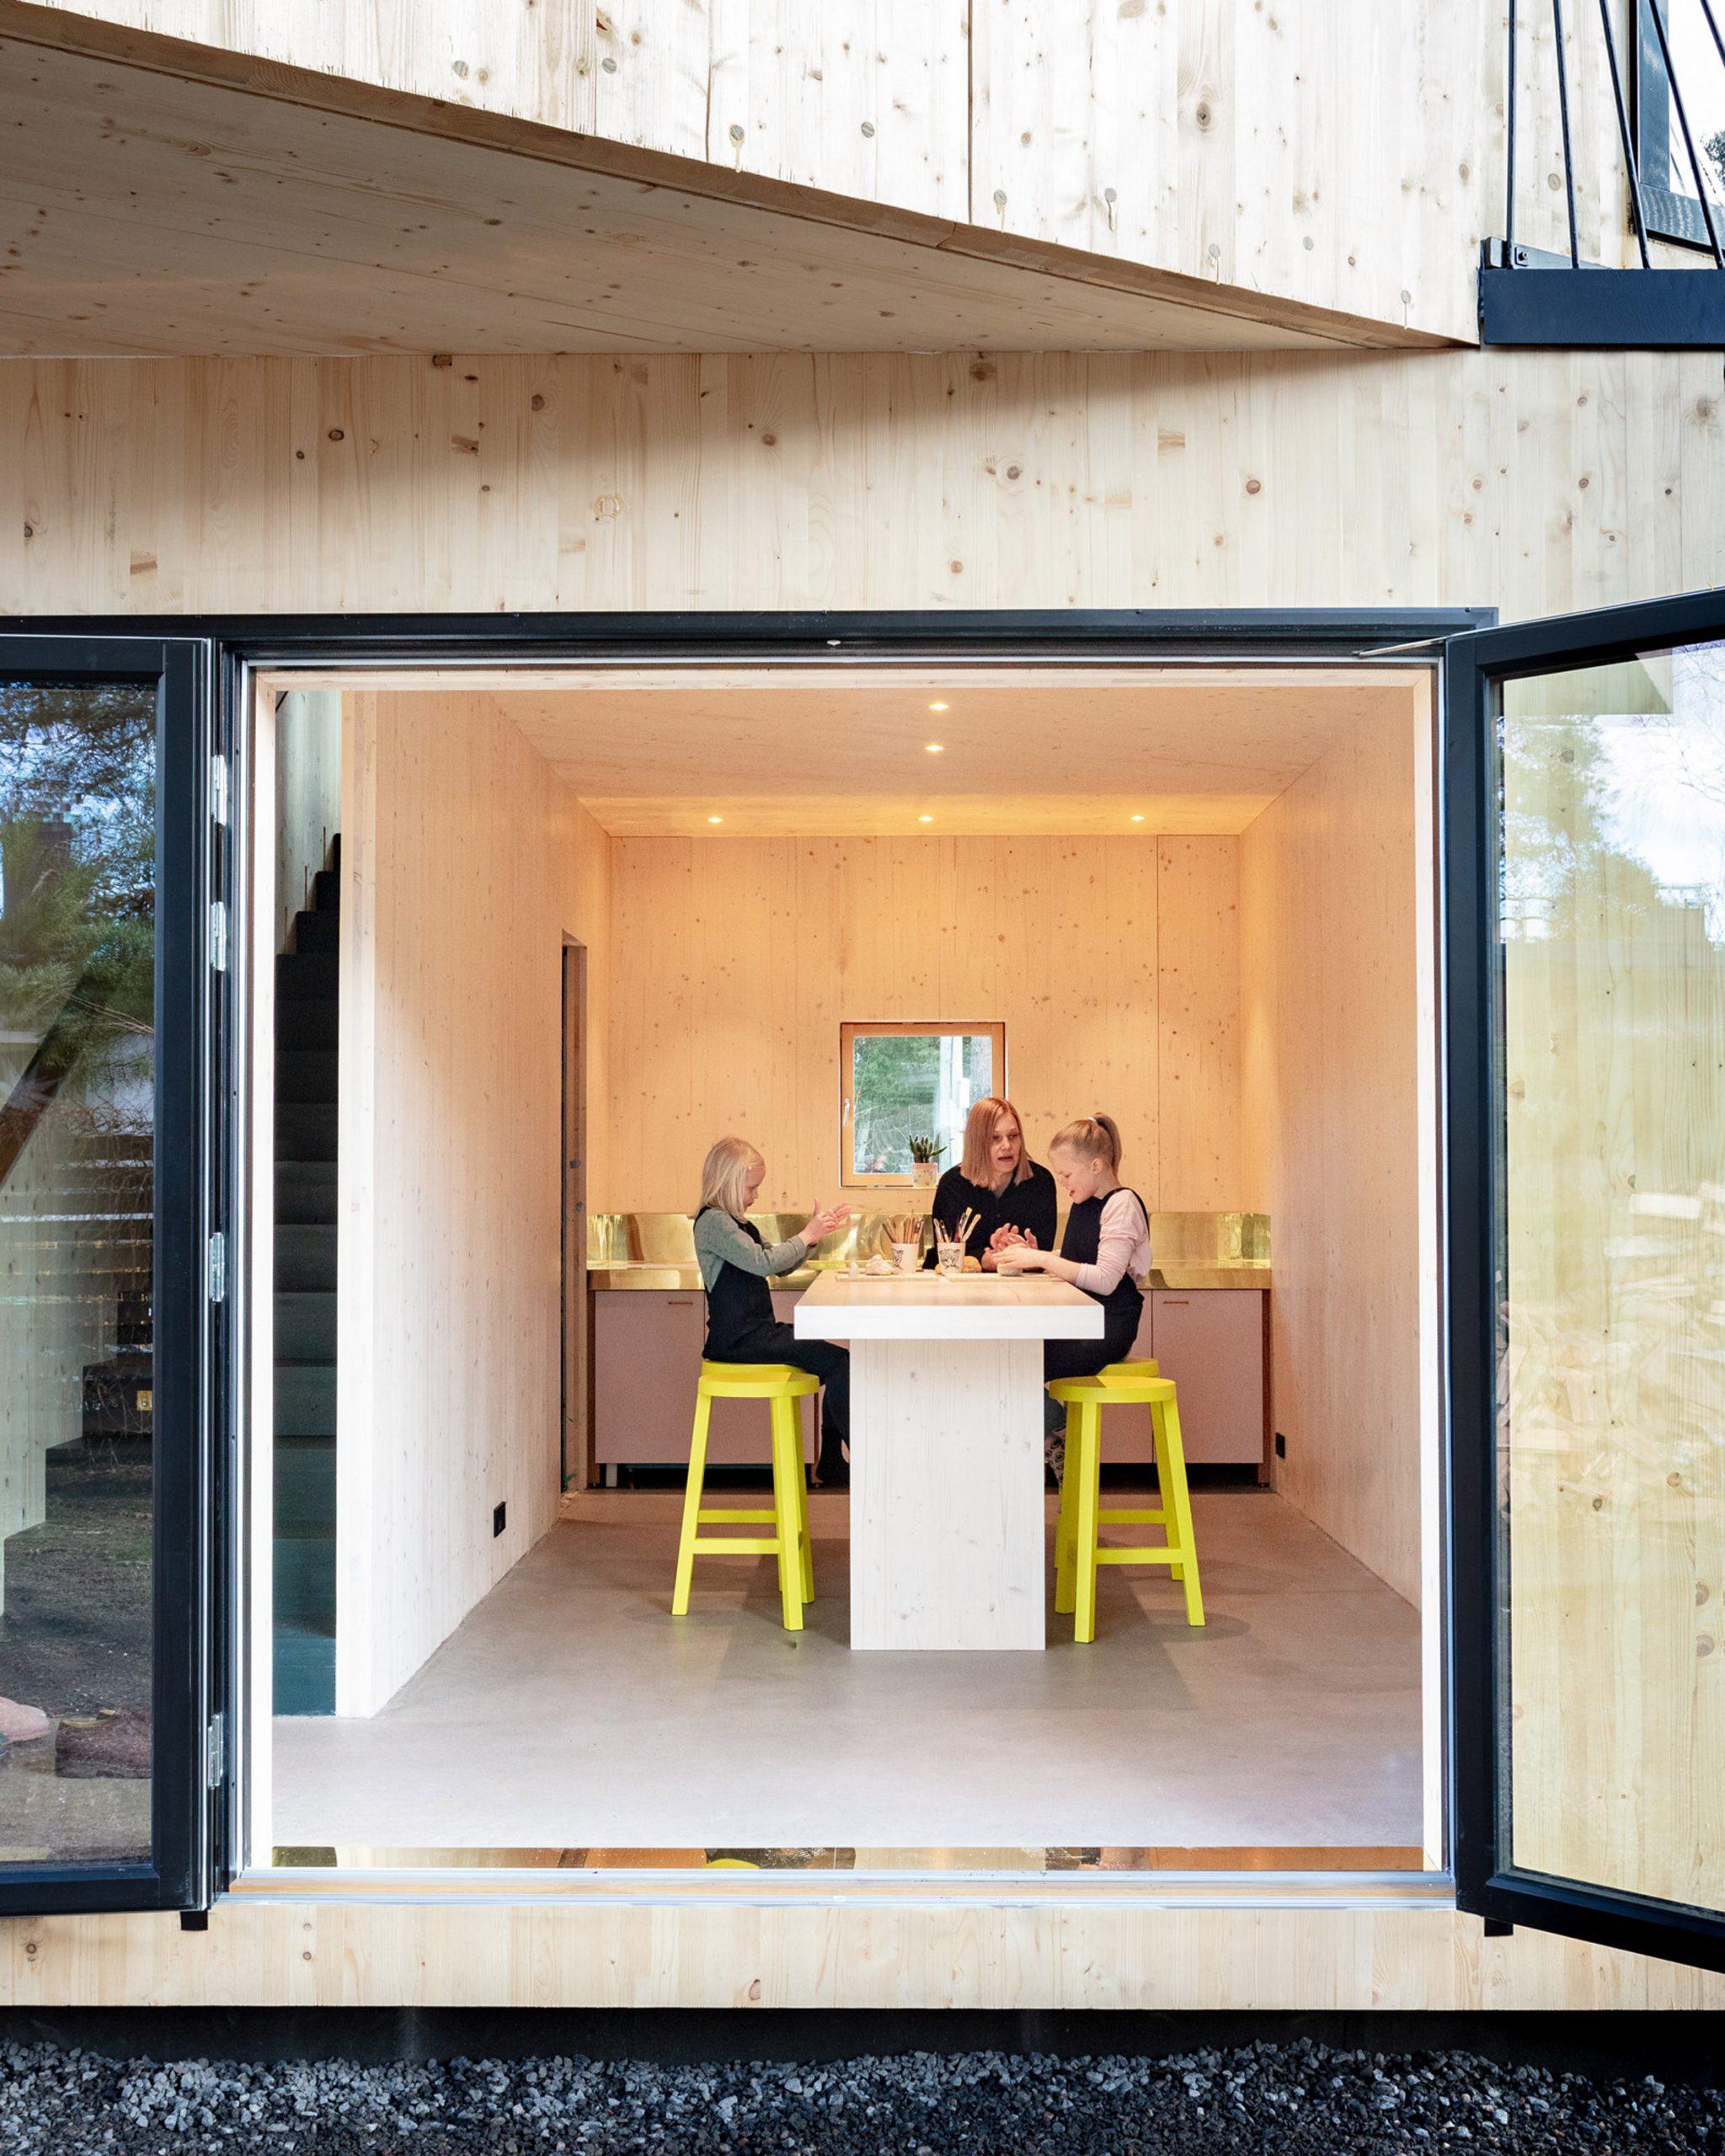 12 studio by Ortraum Architects in Helsinki, Finland